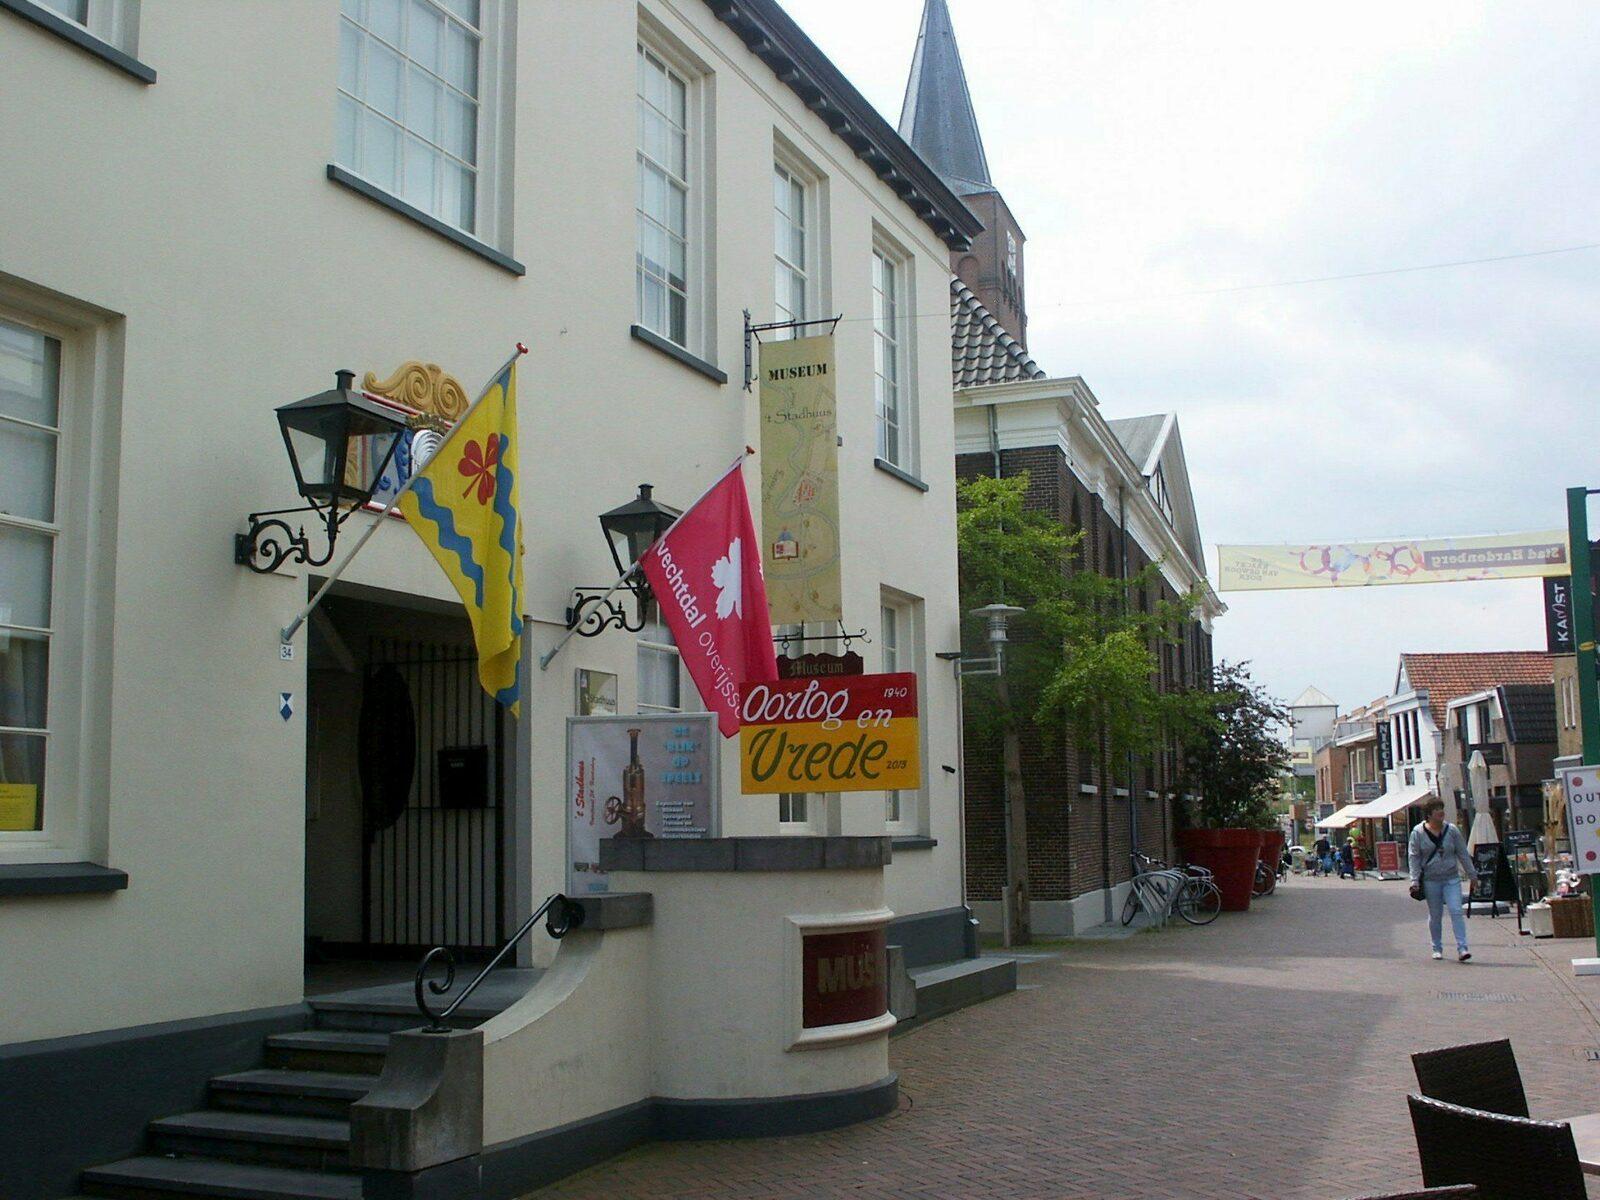 Vechtdal Museum Hardenberg